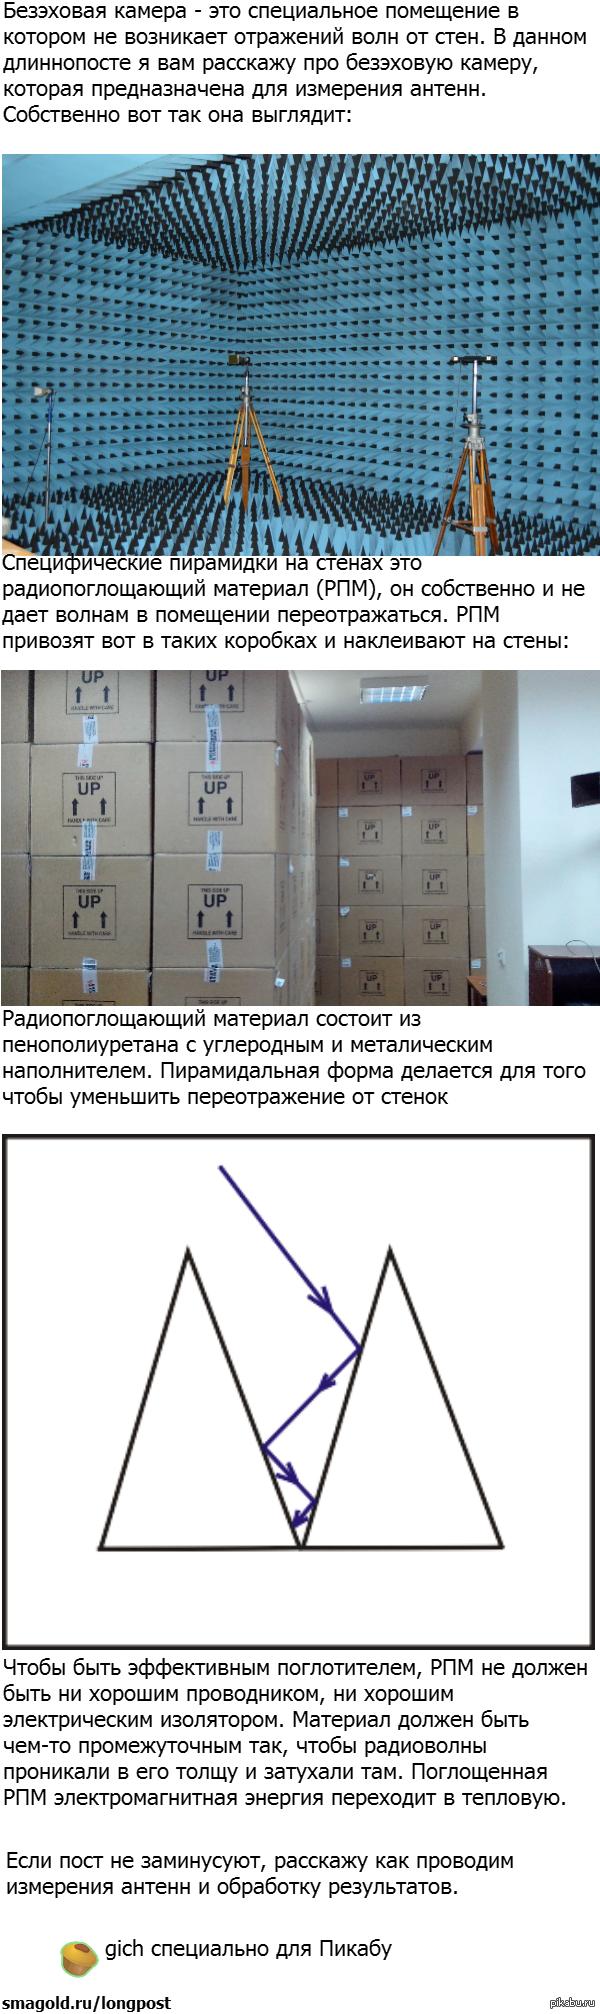 "Безэховая камера. Ознакомление. Мой первый длиннопост-кривопост. Навеяно <a href=""http://pikabu.ru/story/samyie_tikhie_mesta_na_zemle_1958771"">http://pikabu.ru/story/_1958771</a>"